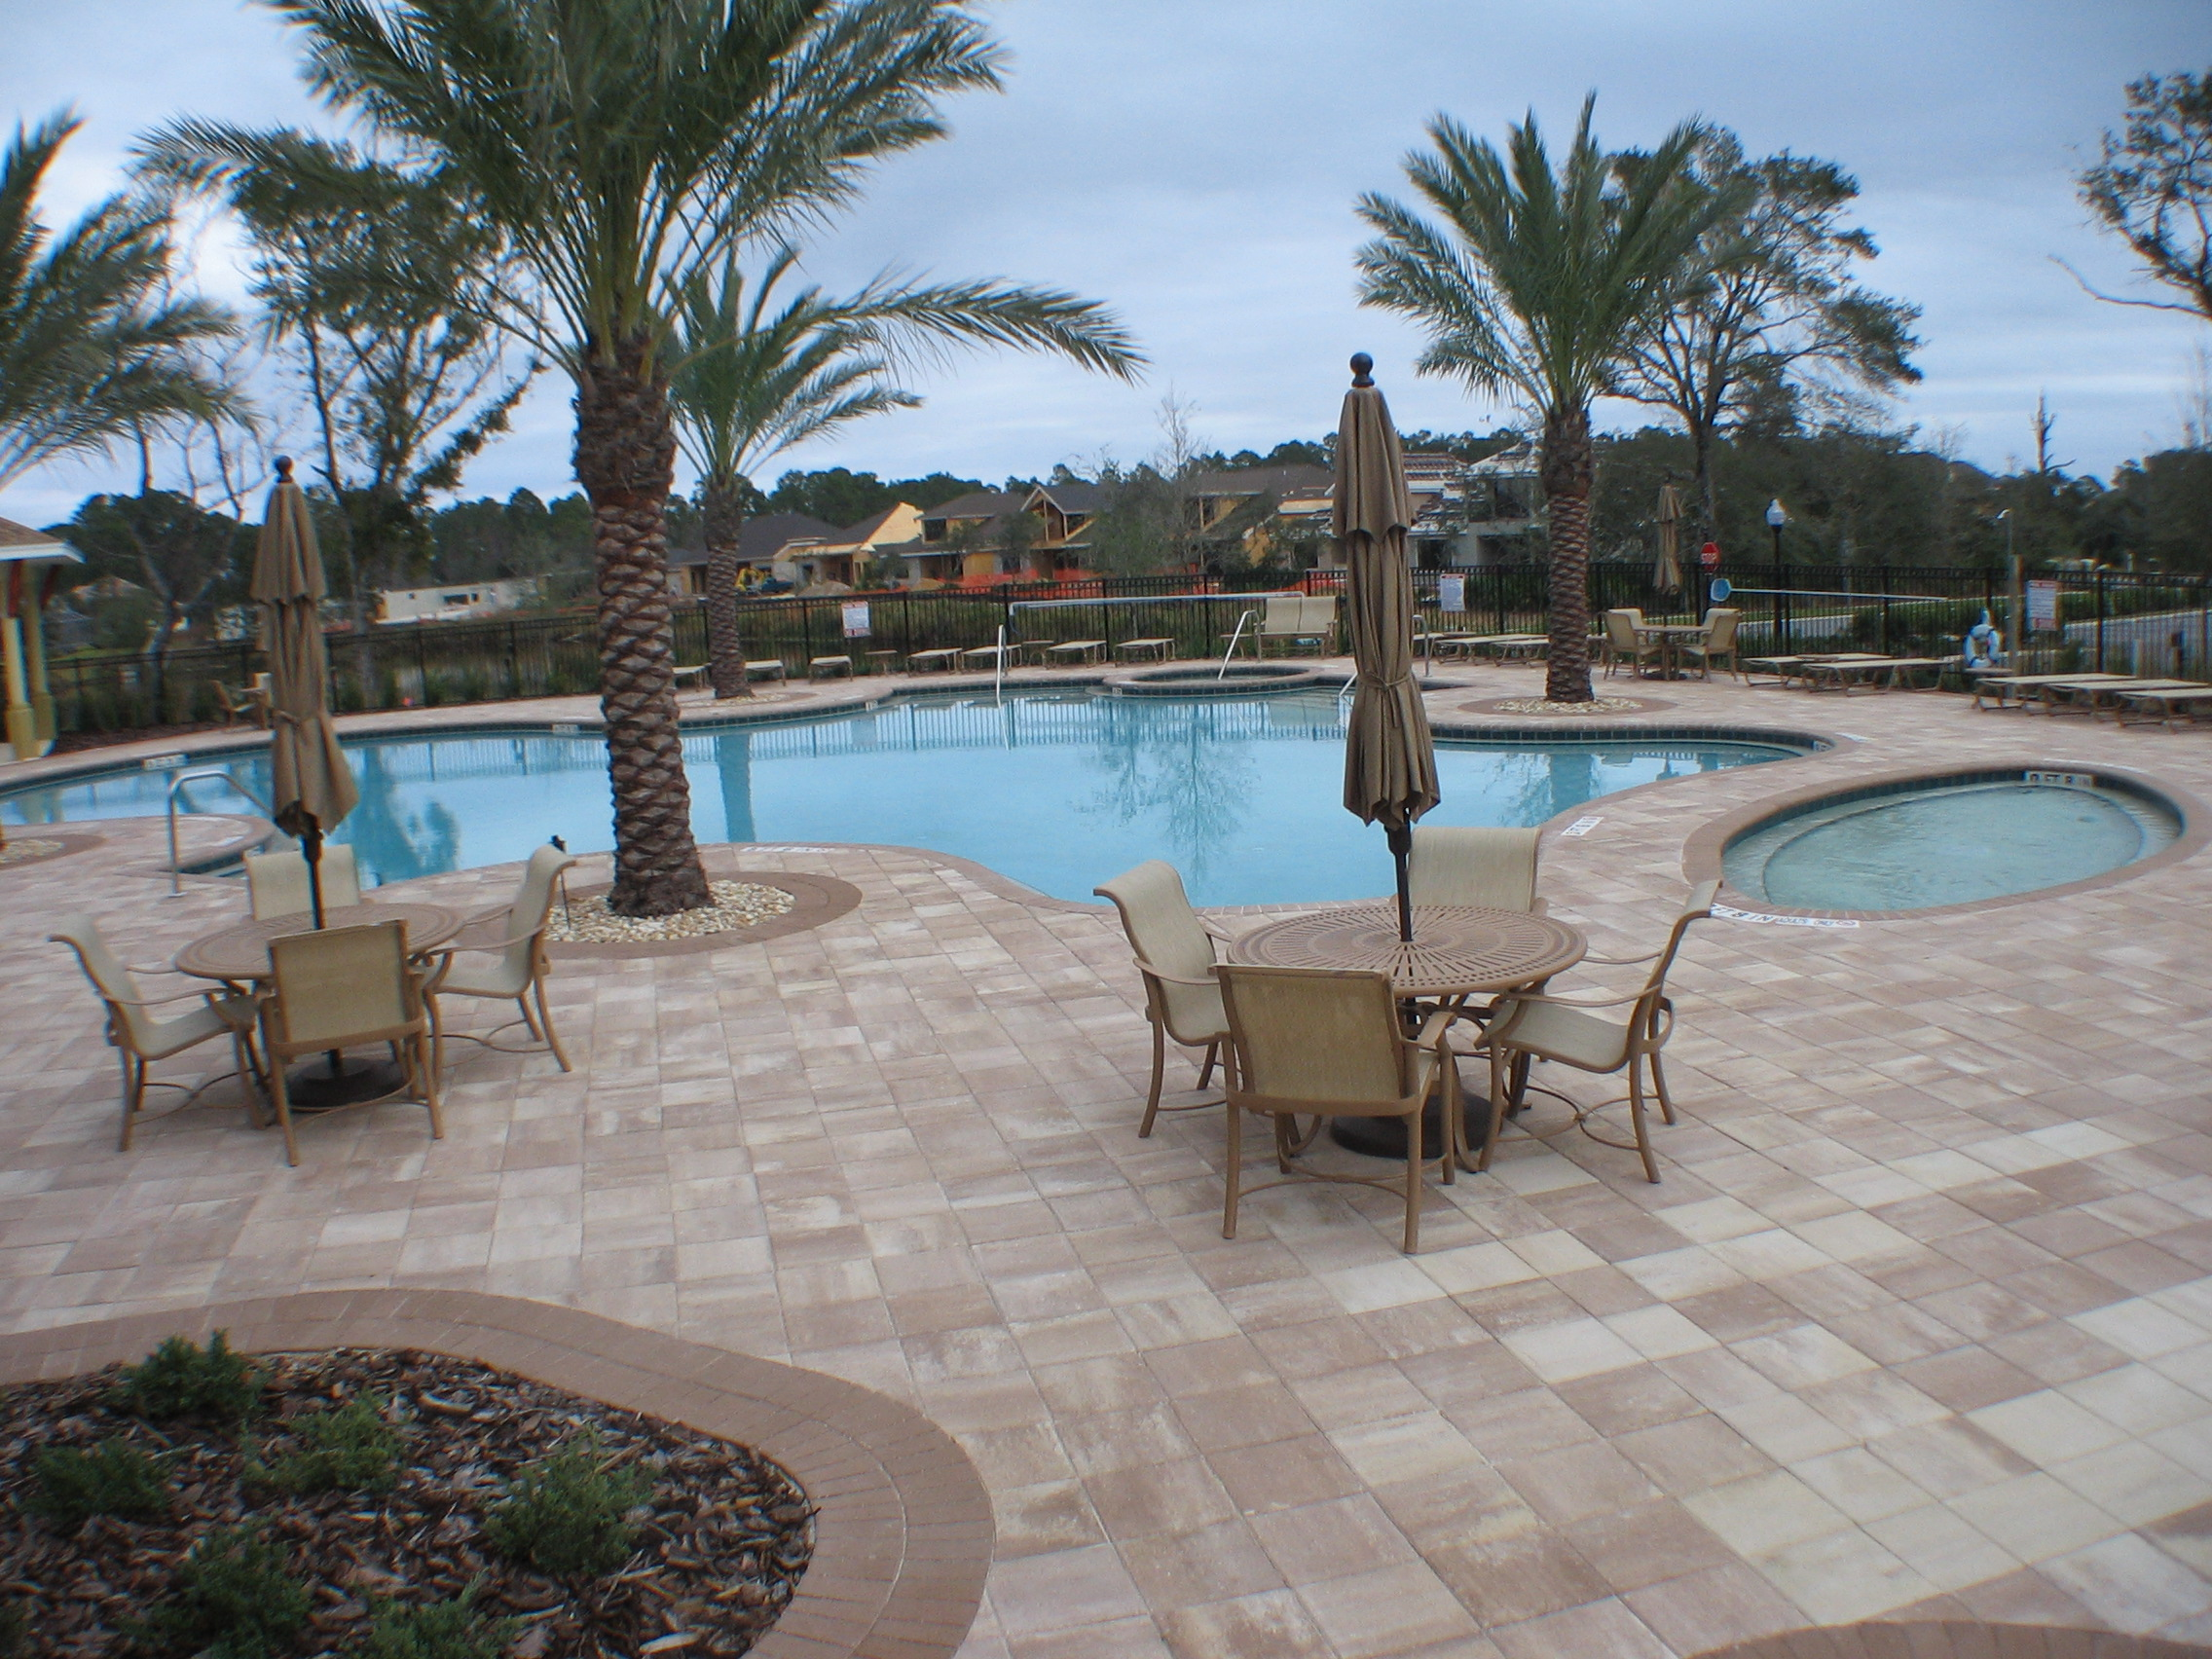 Florida bonded pools phone 904 686 9250 jacksonville for Pool builders jacksonville florida